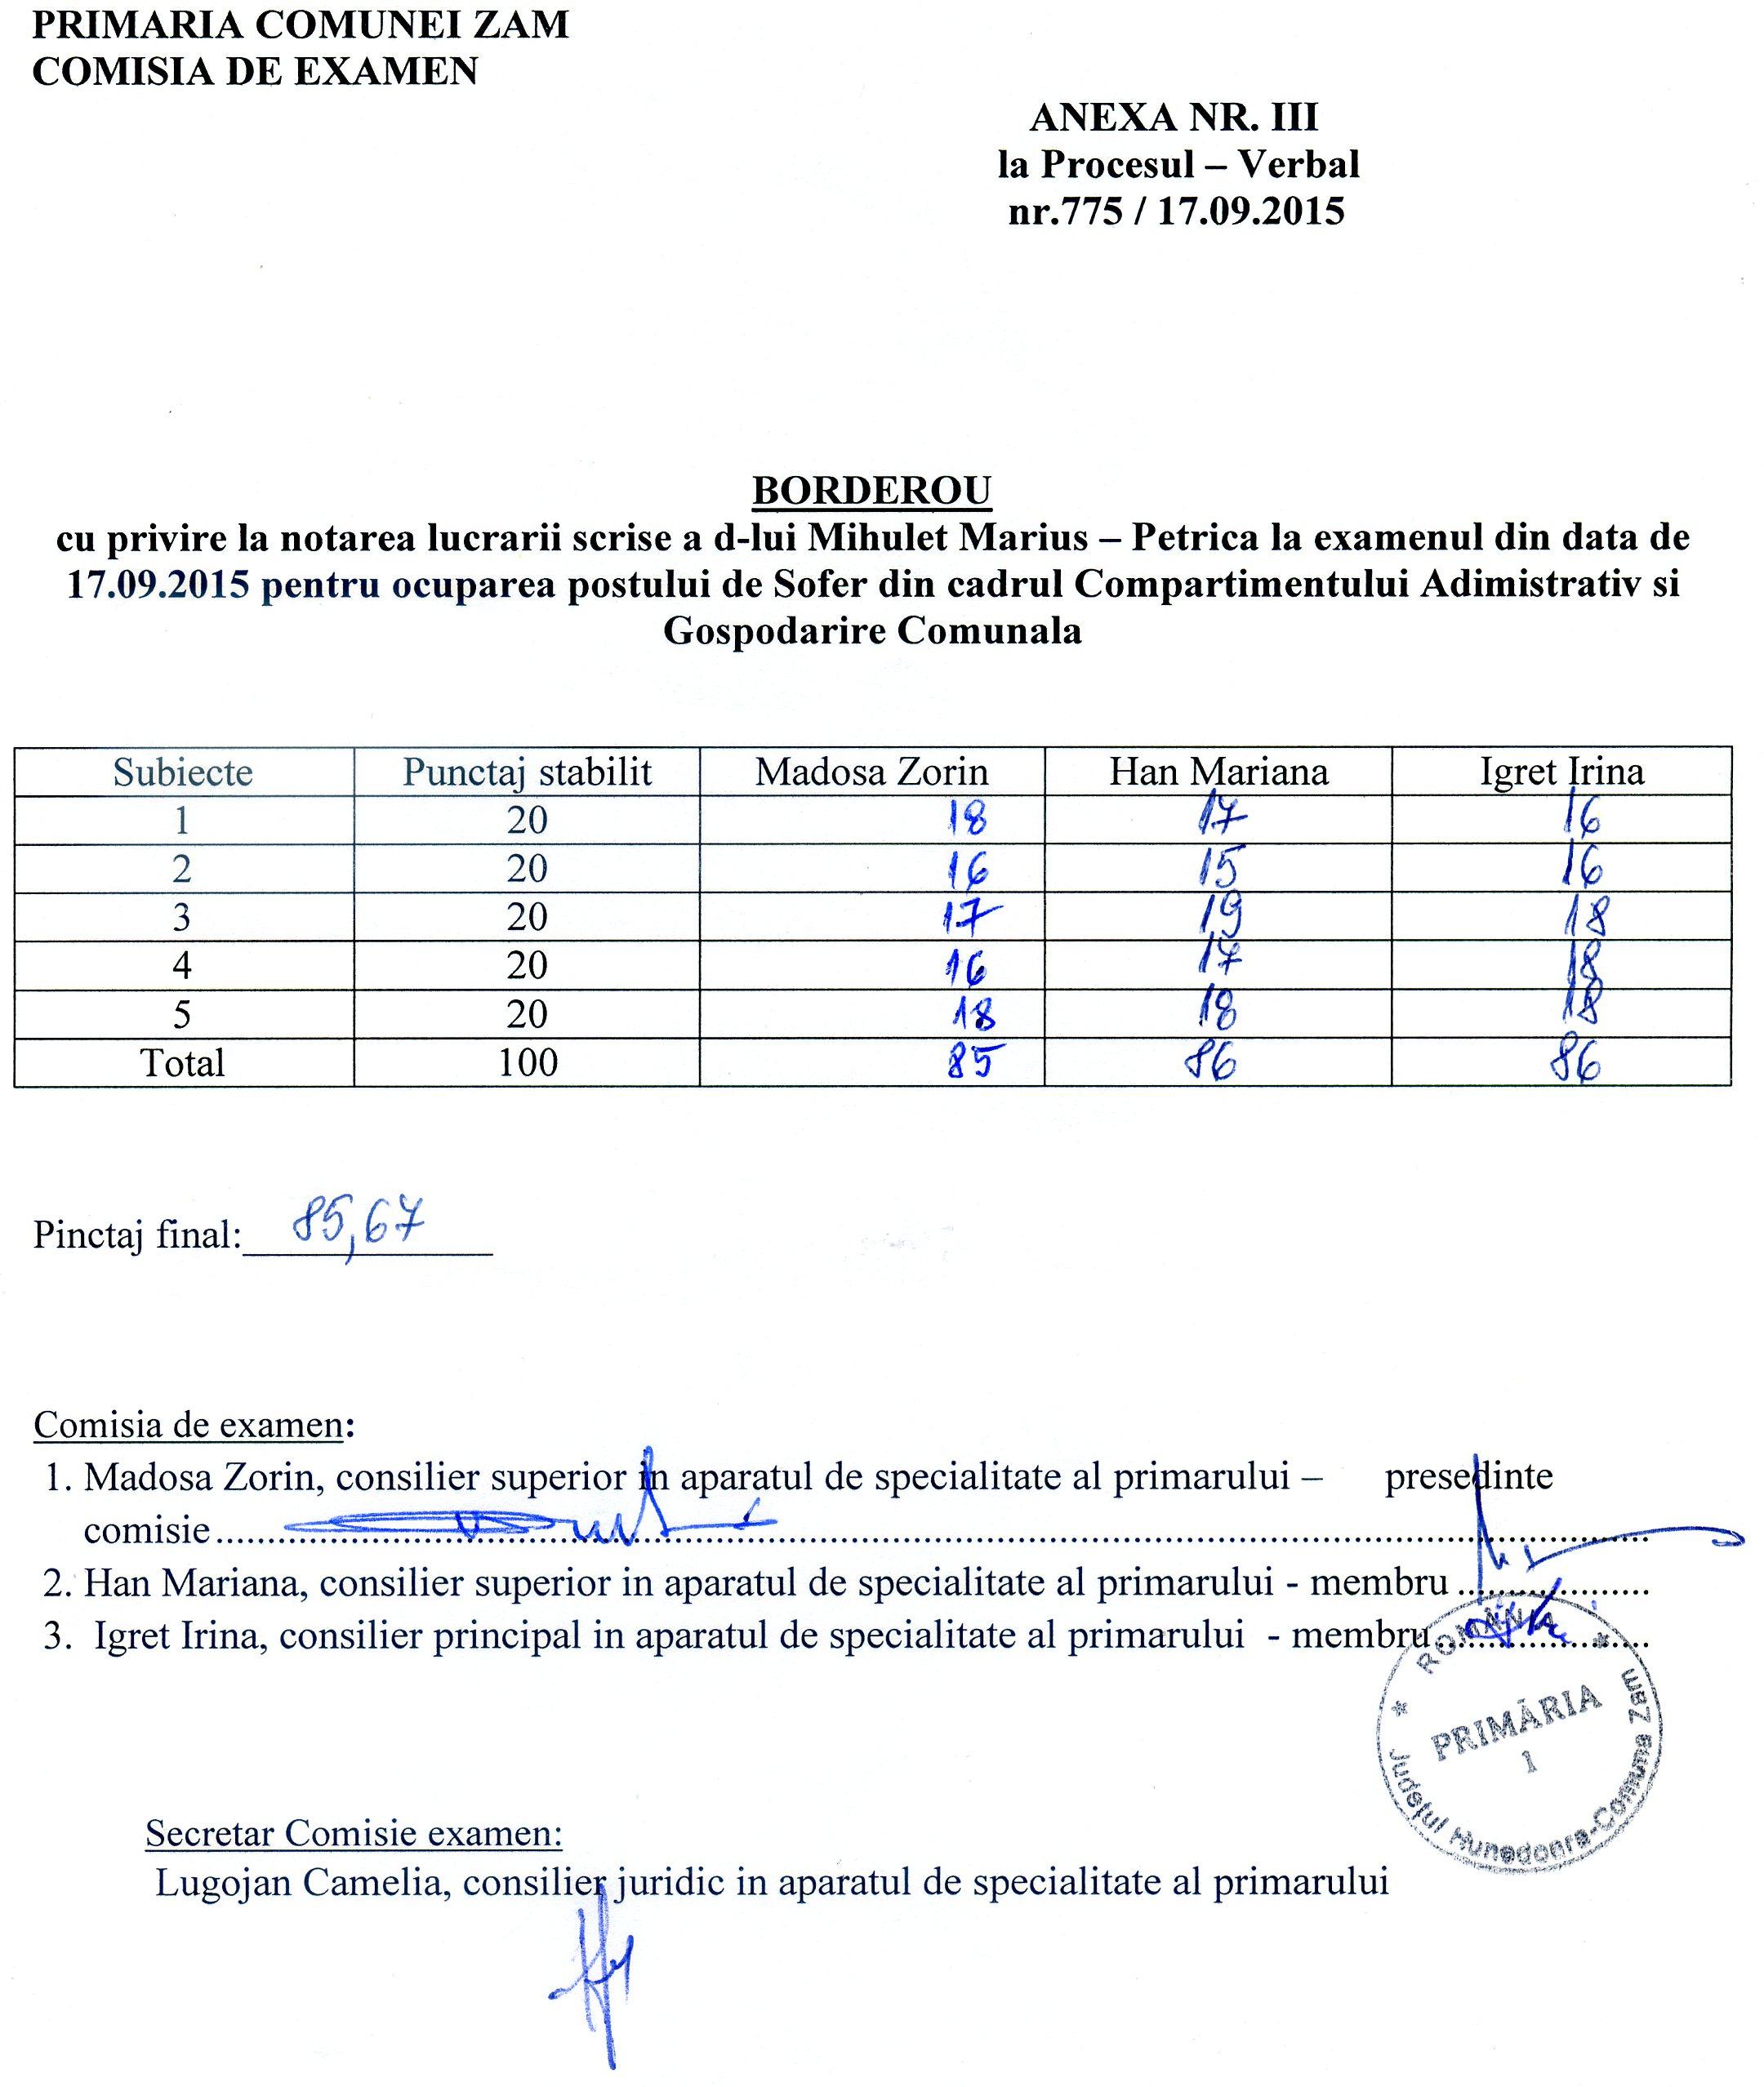 Proces verbal - rezultate proba scrisa, examen sofer.